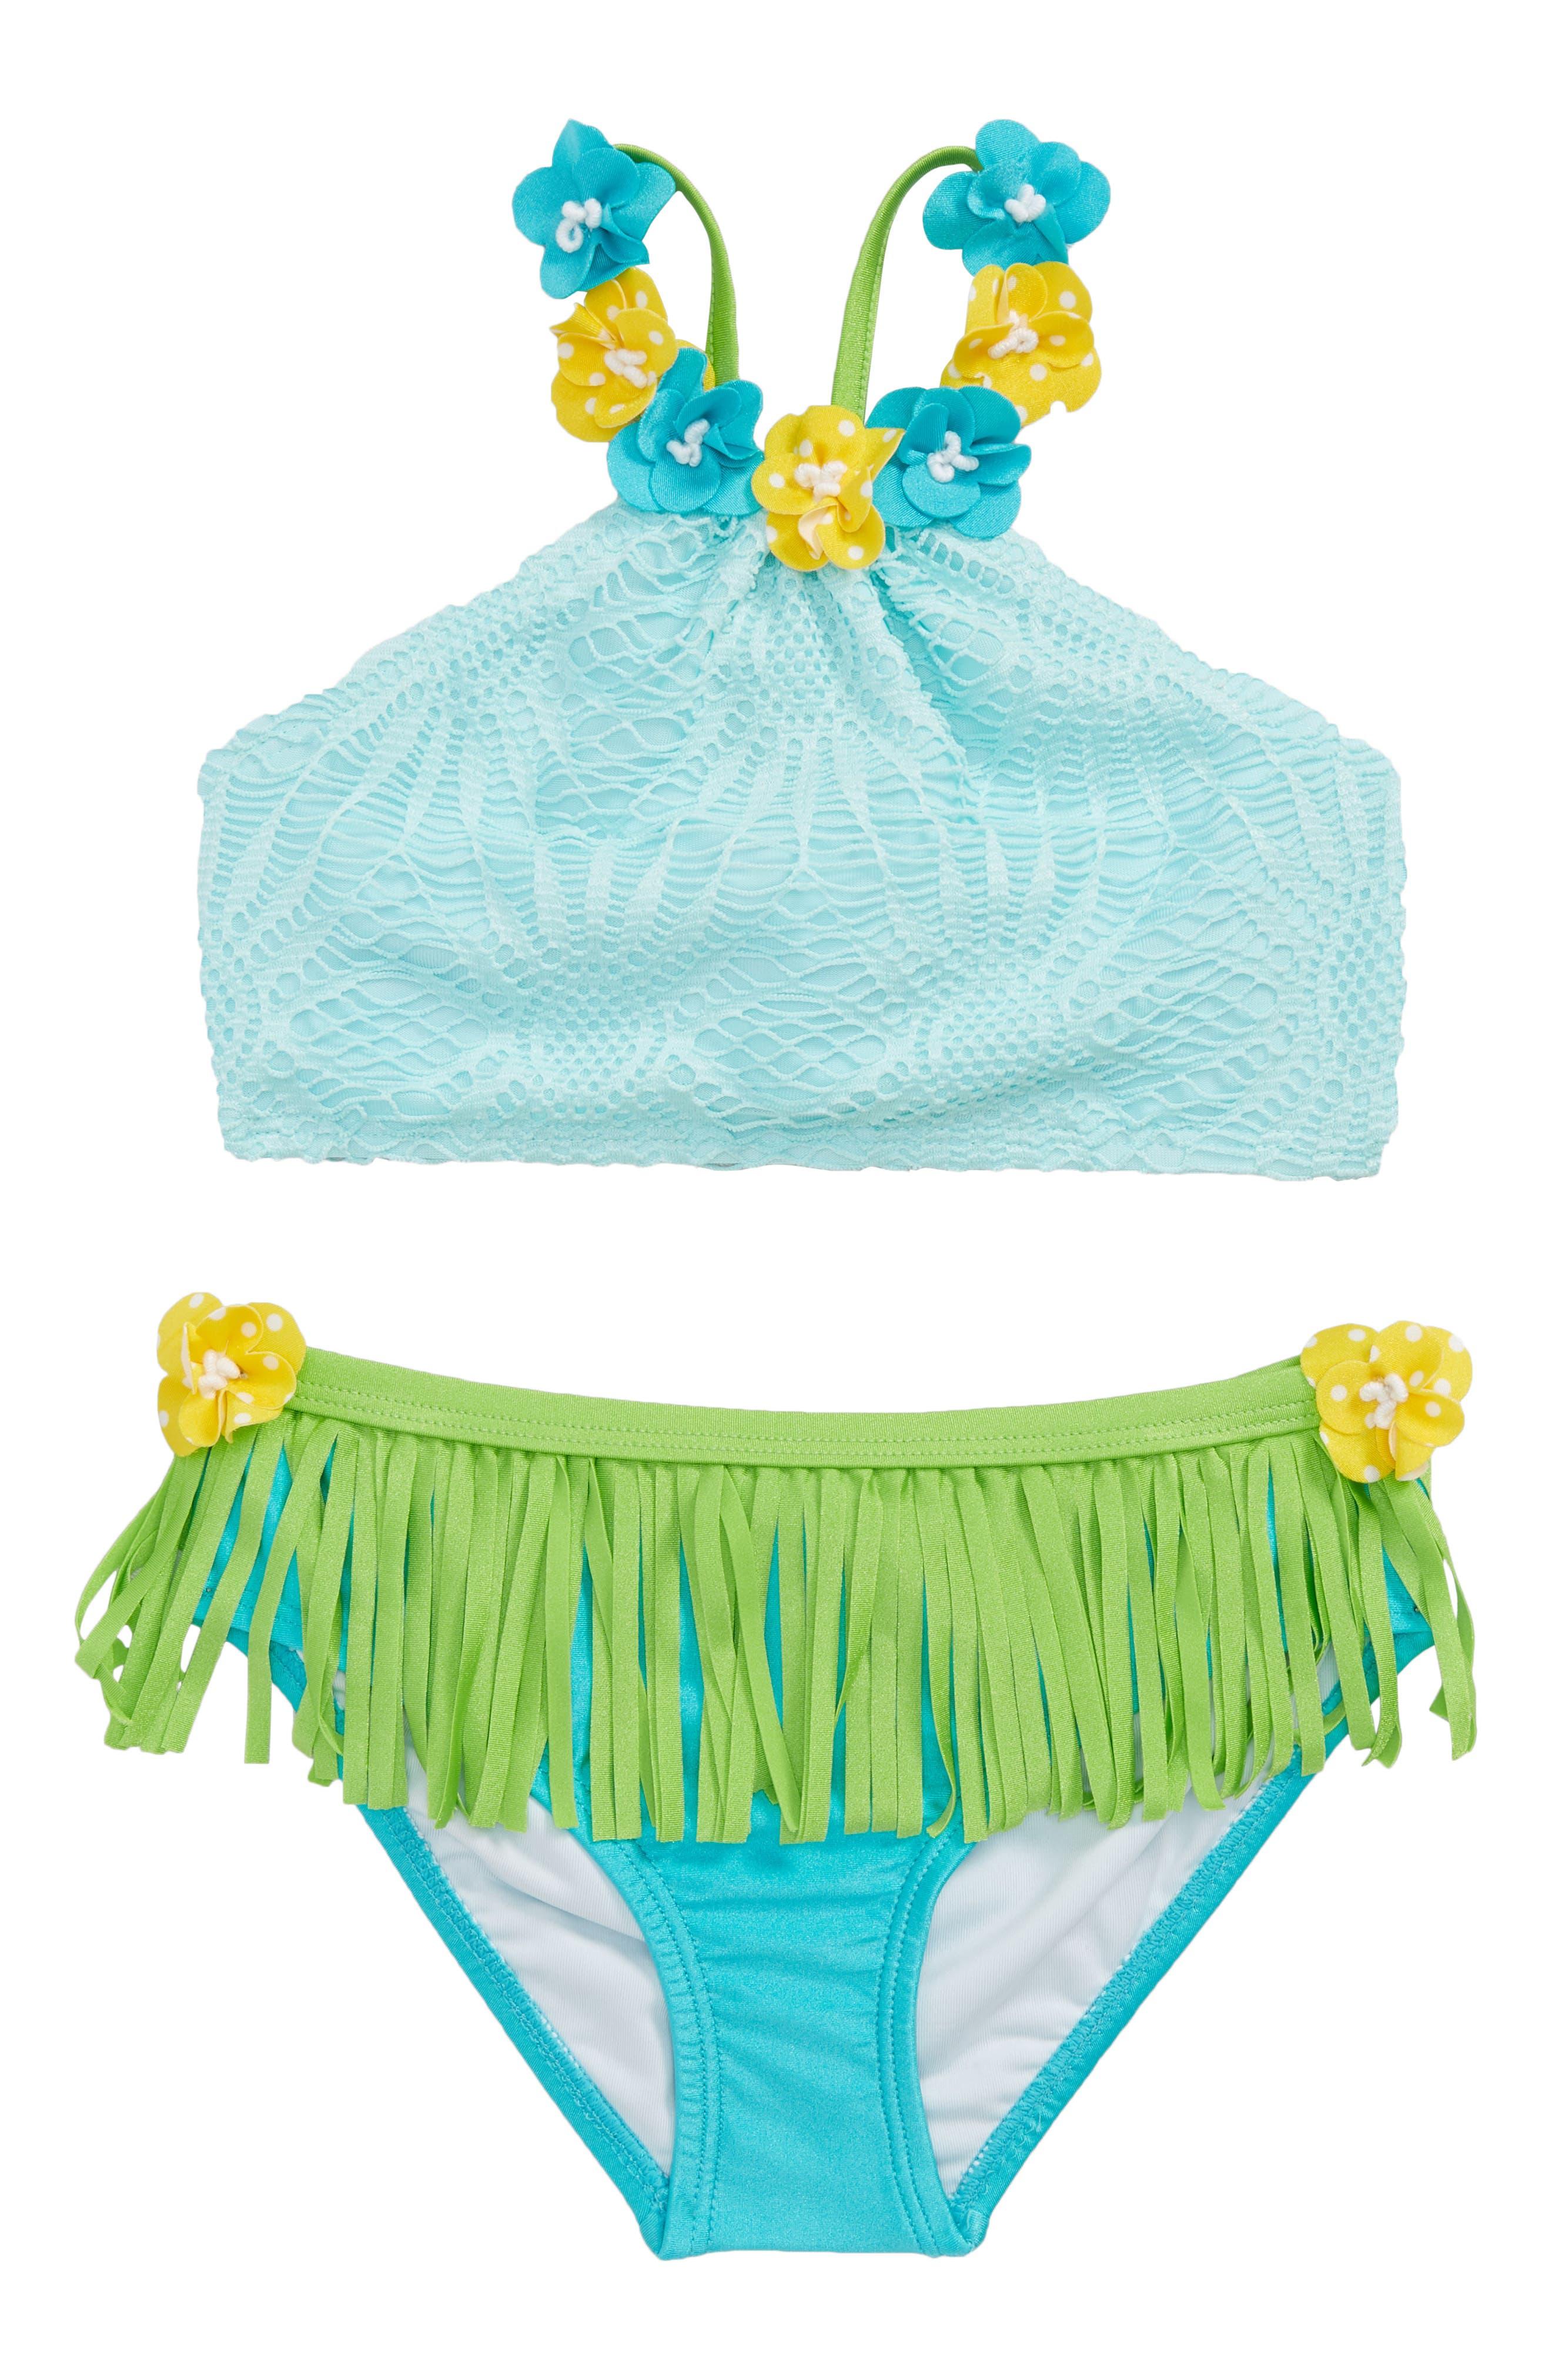 Hula Two-Piece Bikini Swimsuit,                             Main thumbnail 1, color,                             400